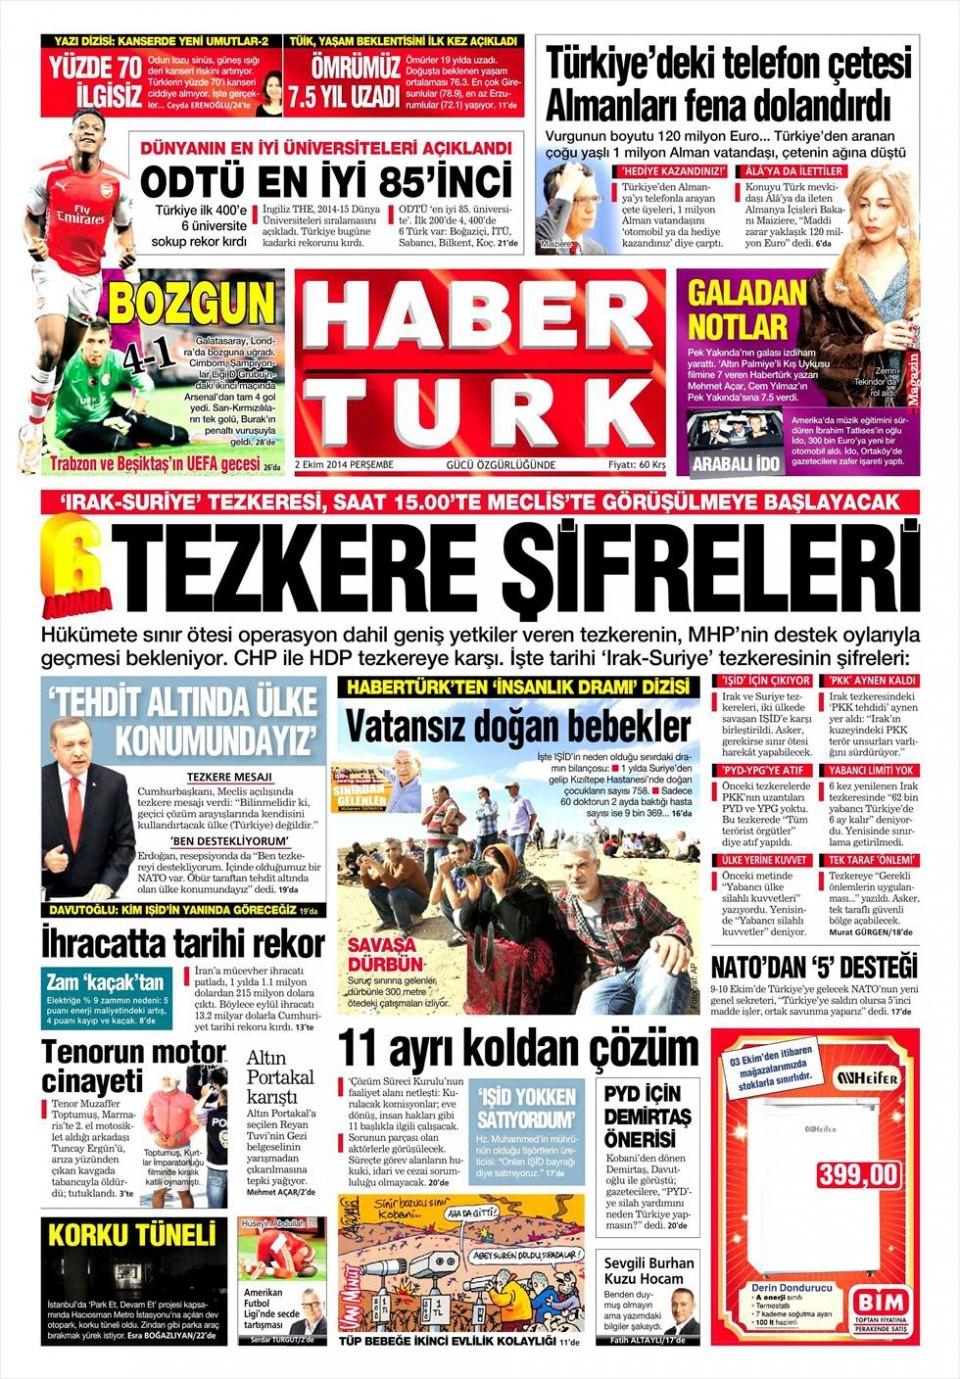 2 Ekim 2014 gazete manşetleri 9